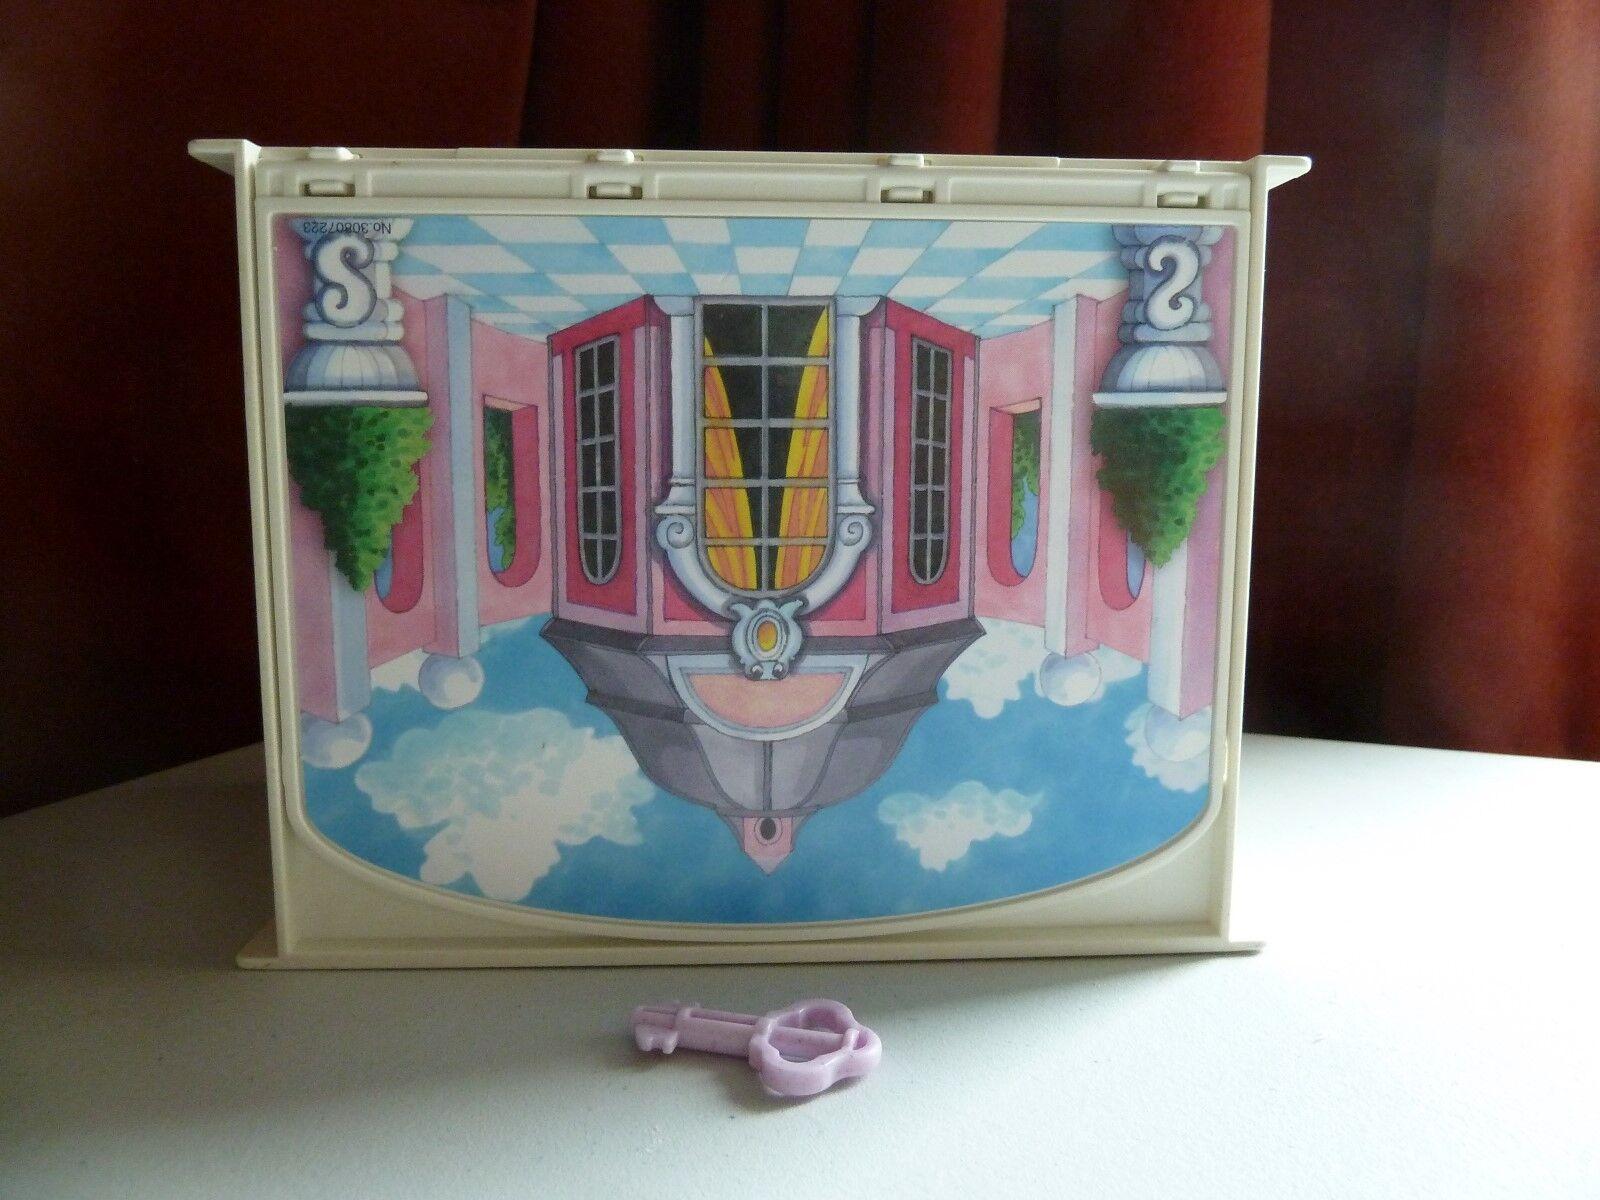 RARE COLLECTIBLE Playmobil Playmobil Playmobil Princess Castle 5419 My Secret Play Box b03f25